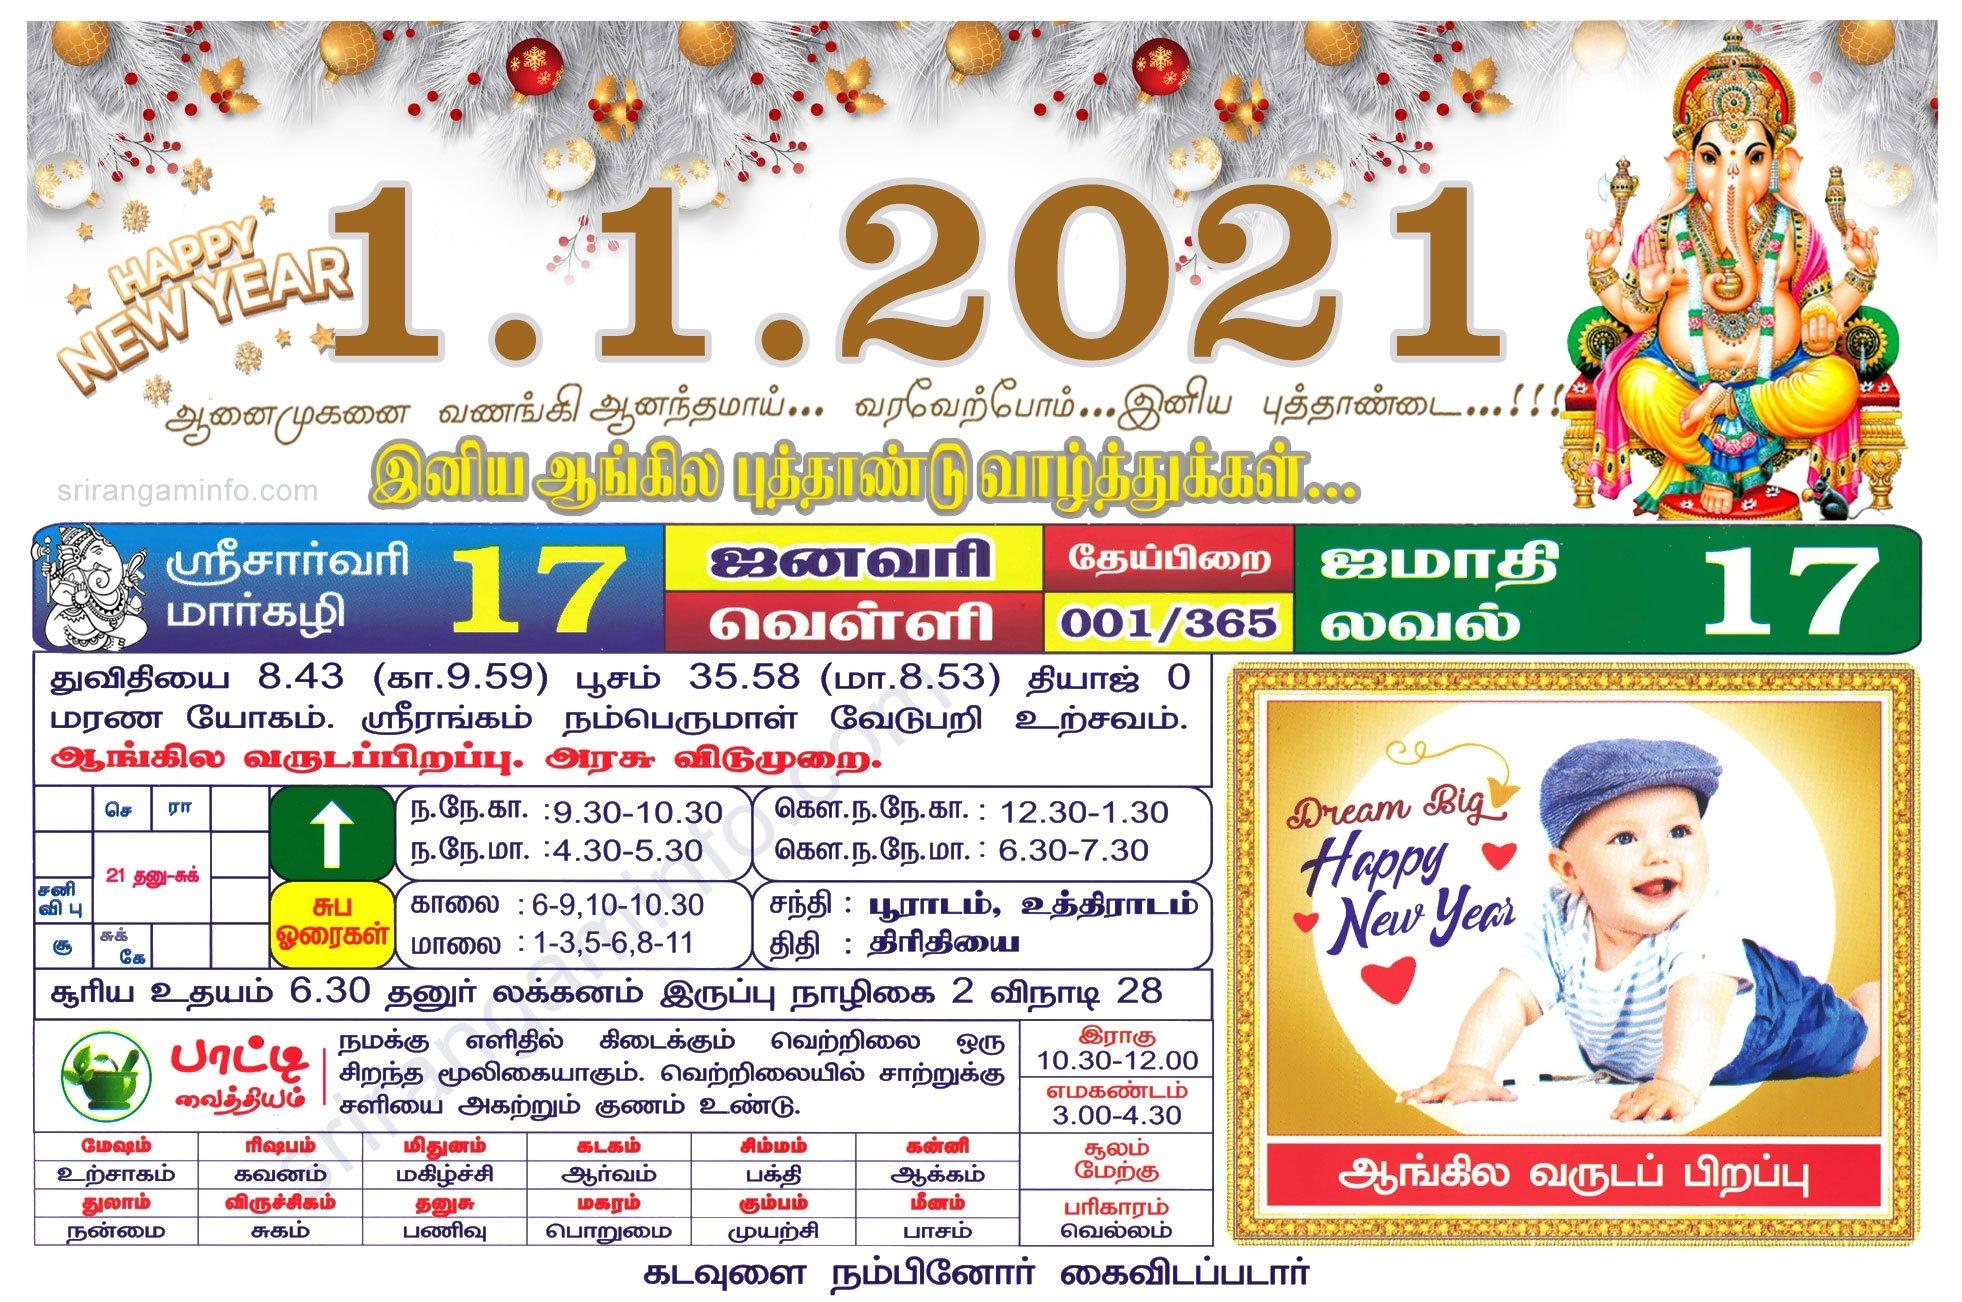 Tamil Daily Calendar 2021, Tamil Calendar 2021, Nalla Neram - தமிழ் தினசரி காலண்டர் in Tamil Calendar 2021 Photos